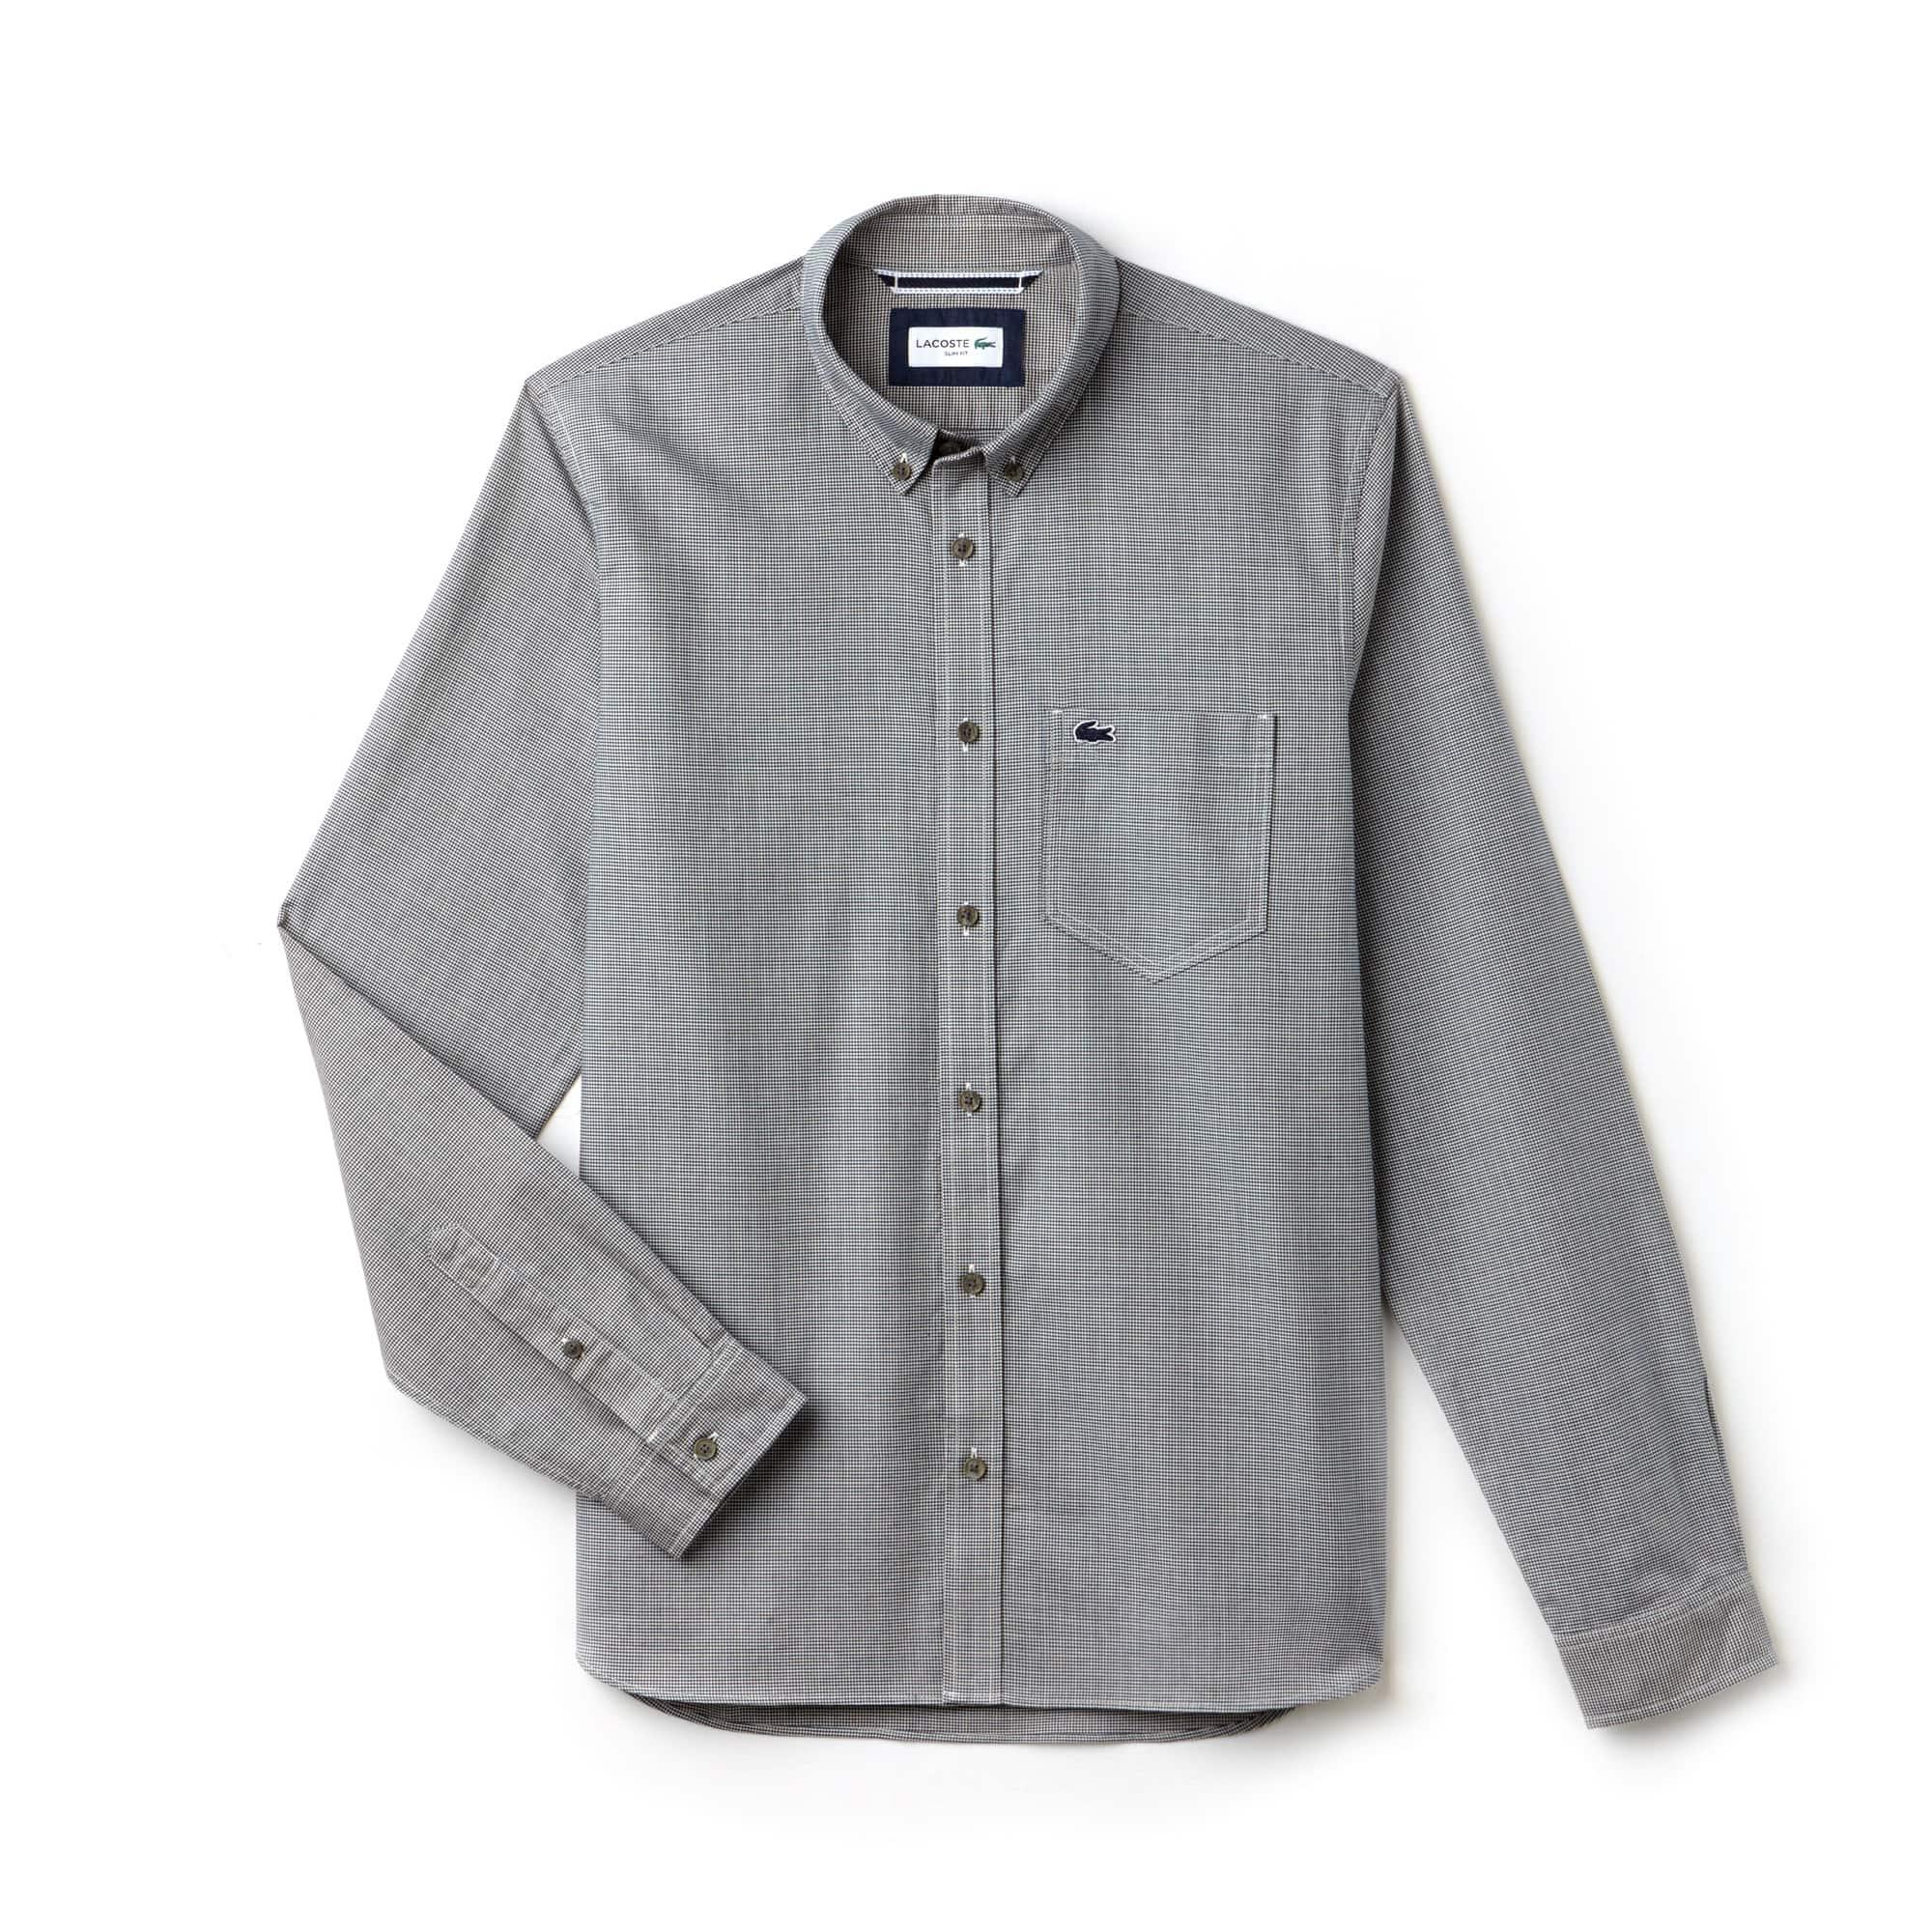 Men's Slim Fit Houndstooth Print Poplin Shirt